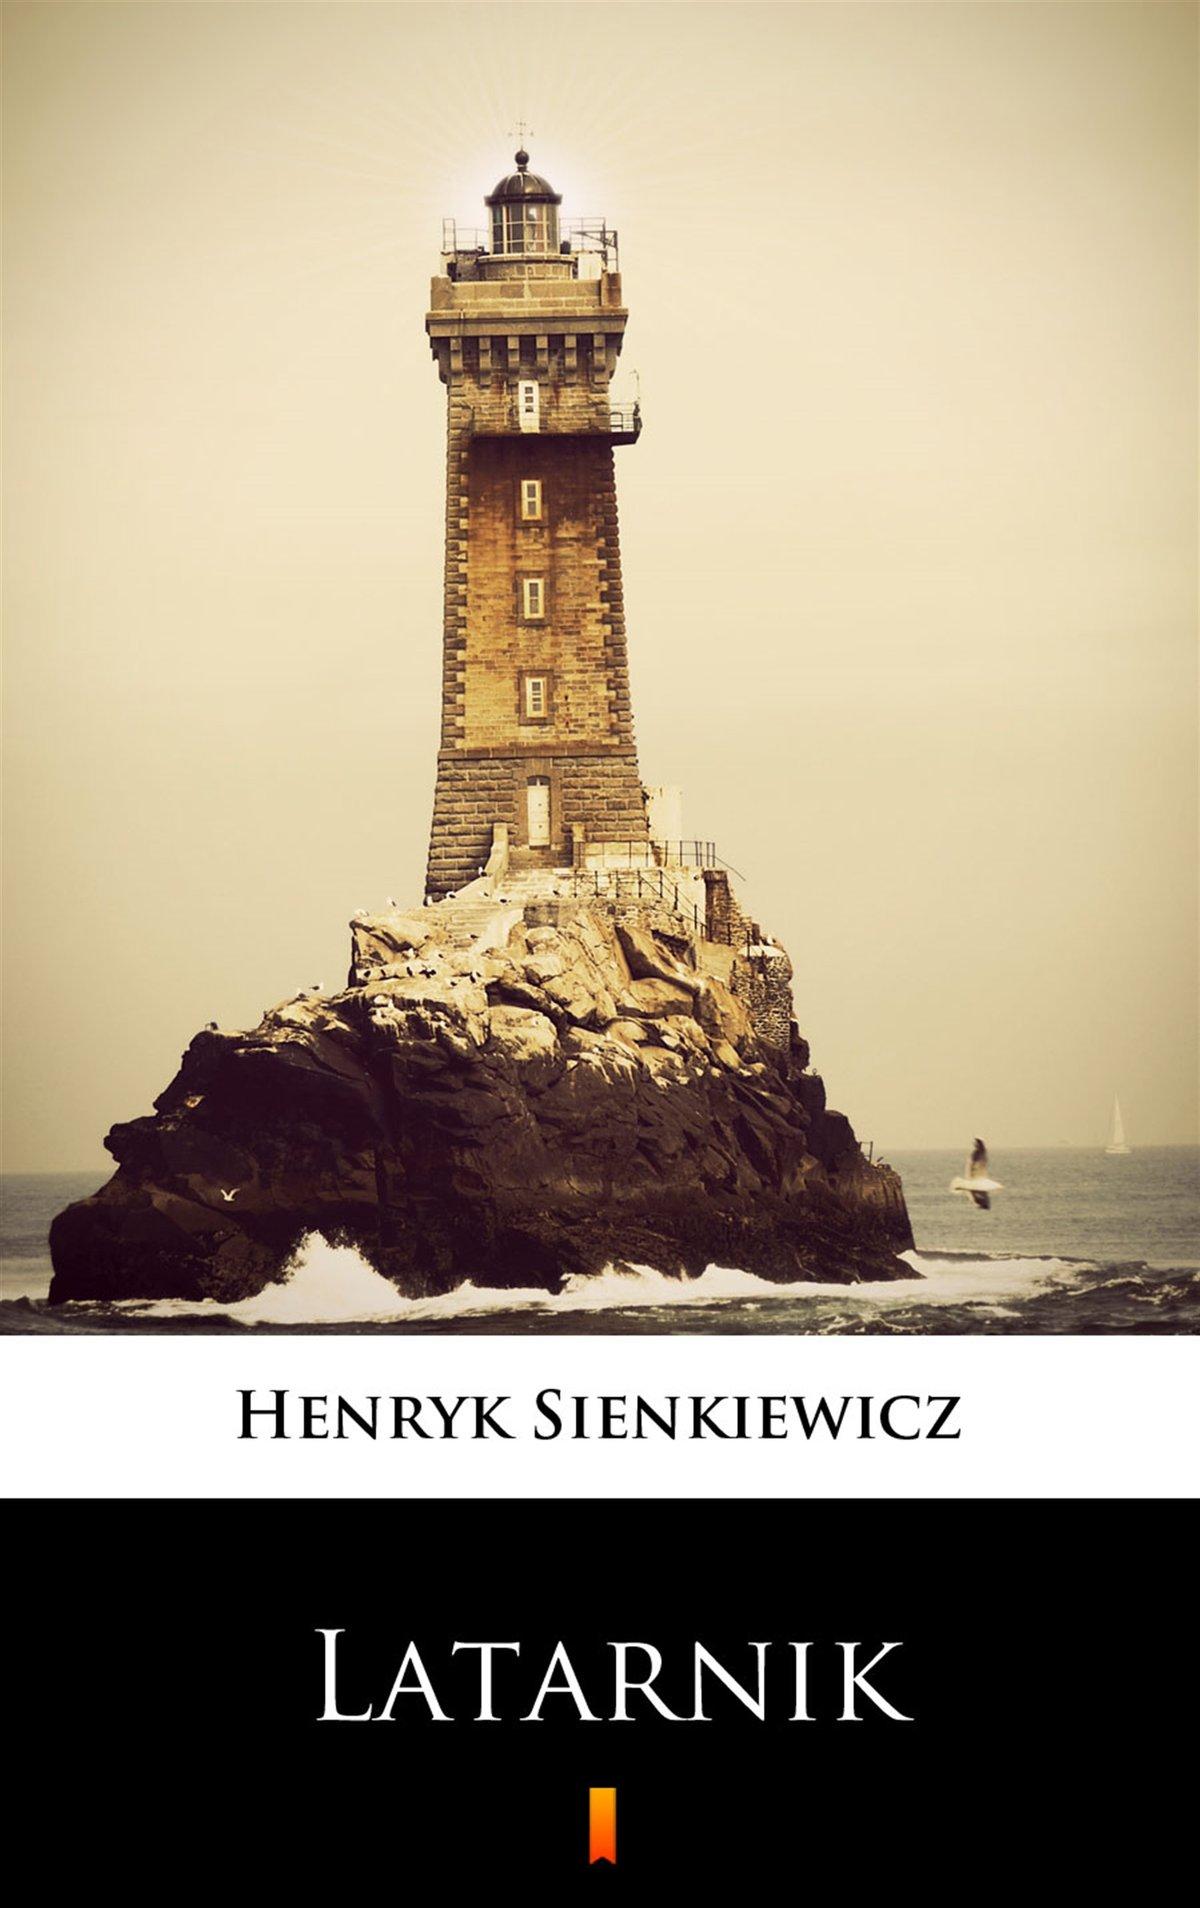 Latarnik - Ebook (Książka na Kindle) do pobrania w formacie MOBI